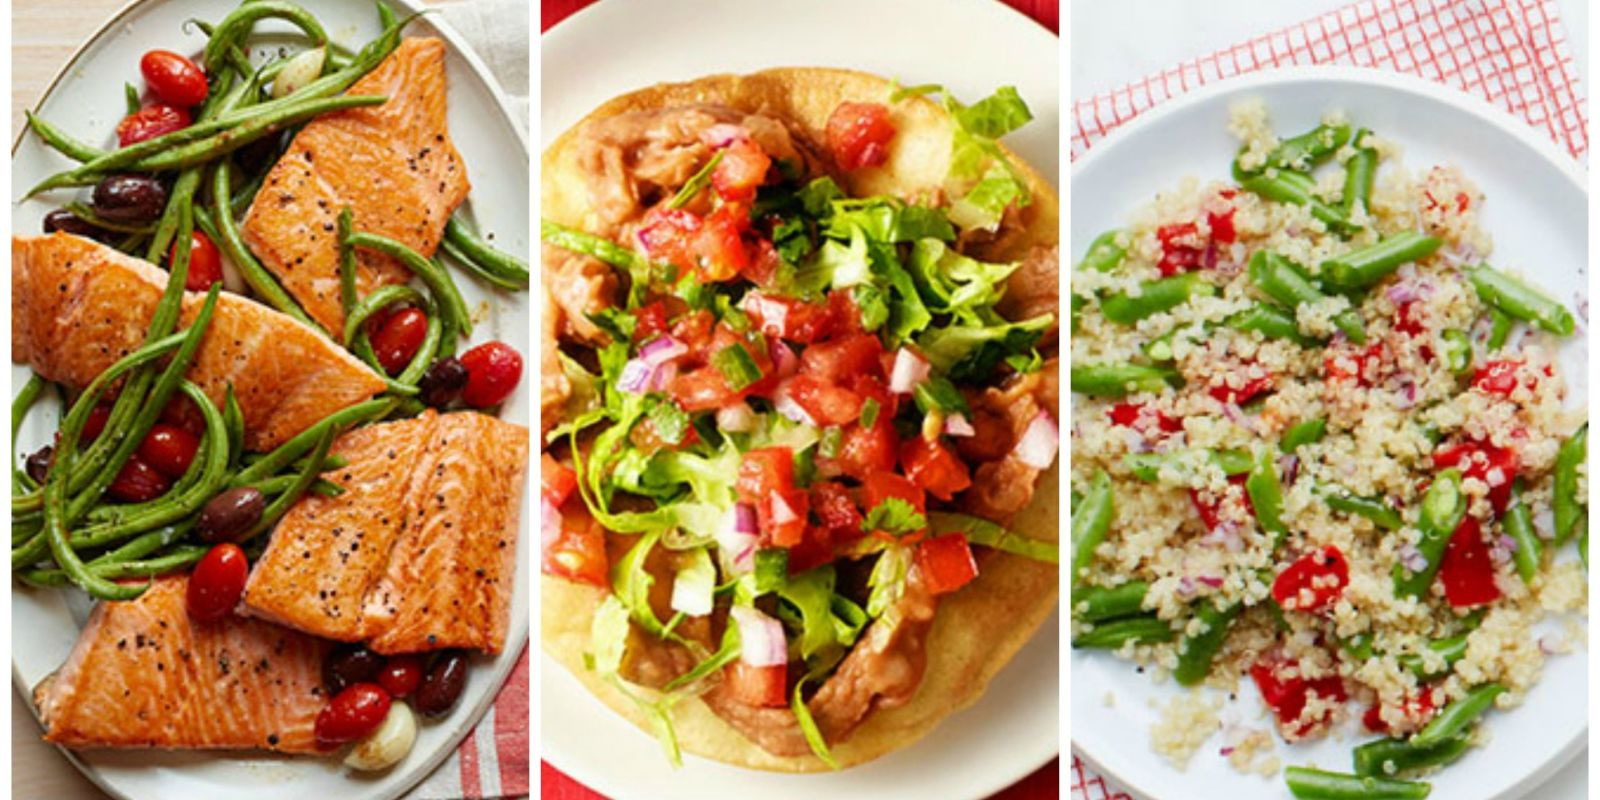 Heart Healthy Recipes Easy  15 Easy Heart Healthy Recipes Quick Heart Healthy Meals